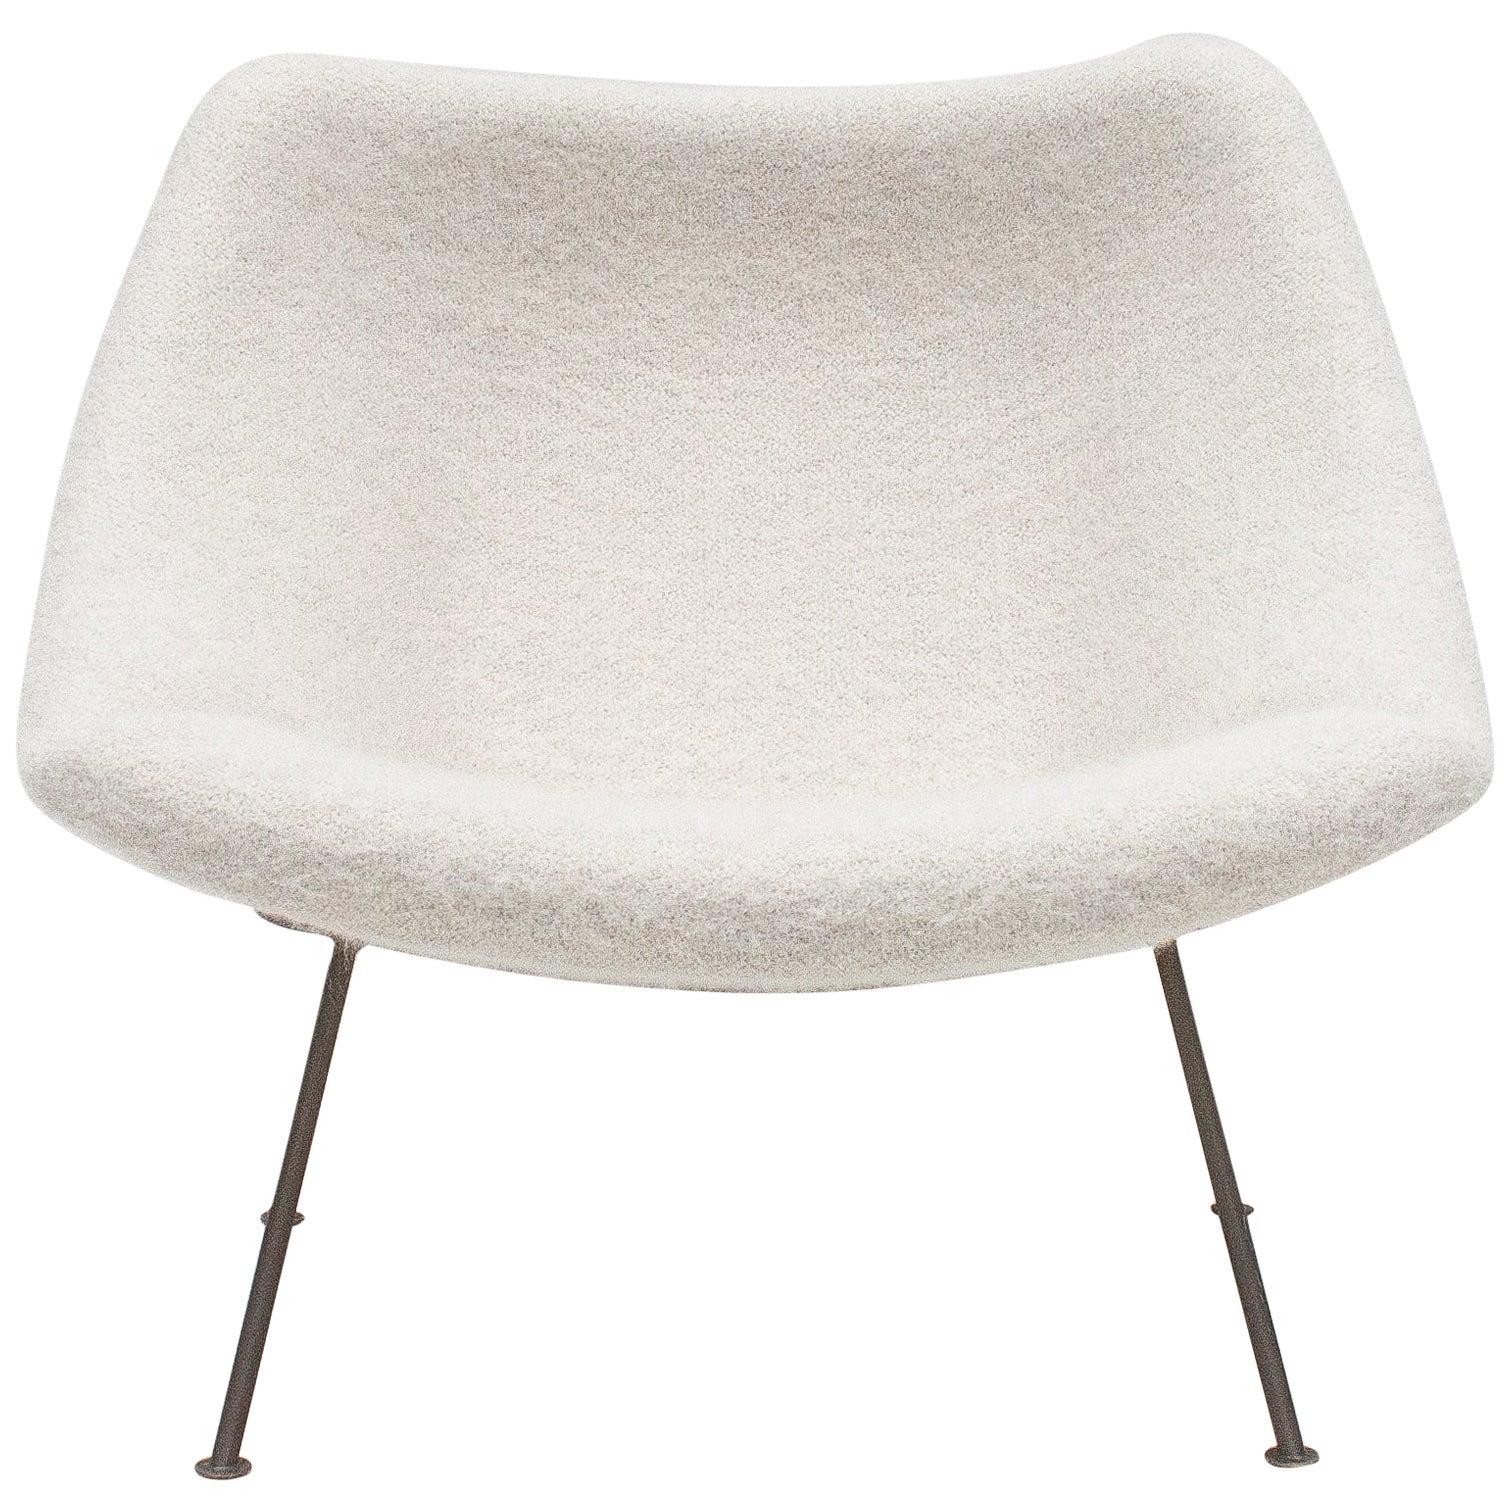 1st Edition Pierre Paulin F156 'Little Oyster' Lounge Chair in Pierre Frey 1960s